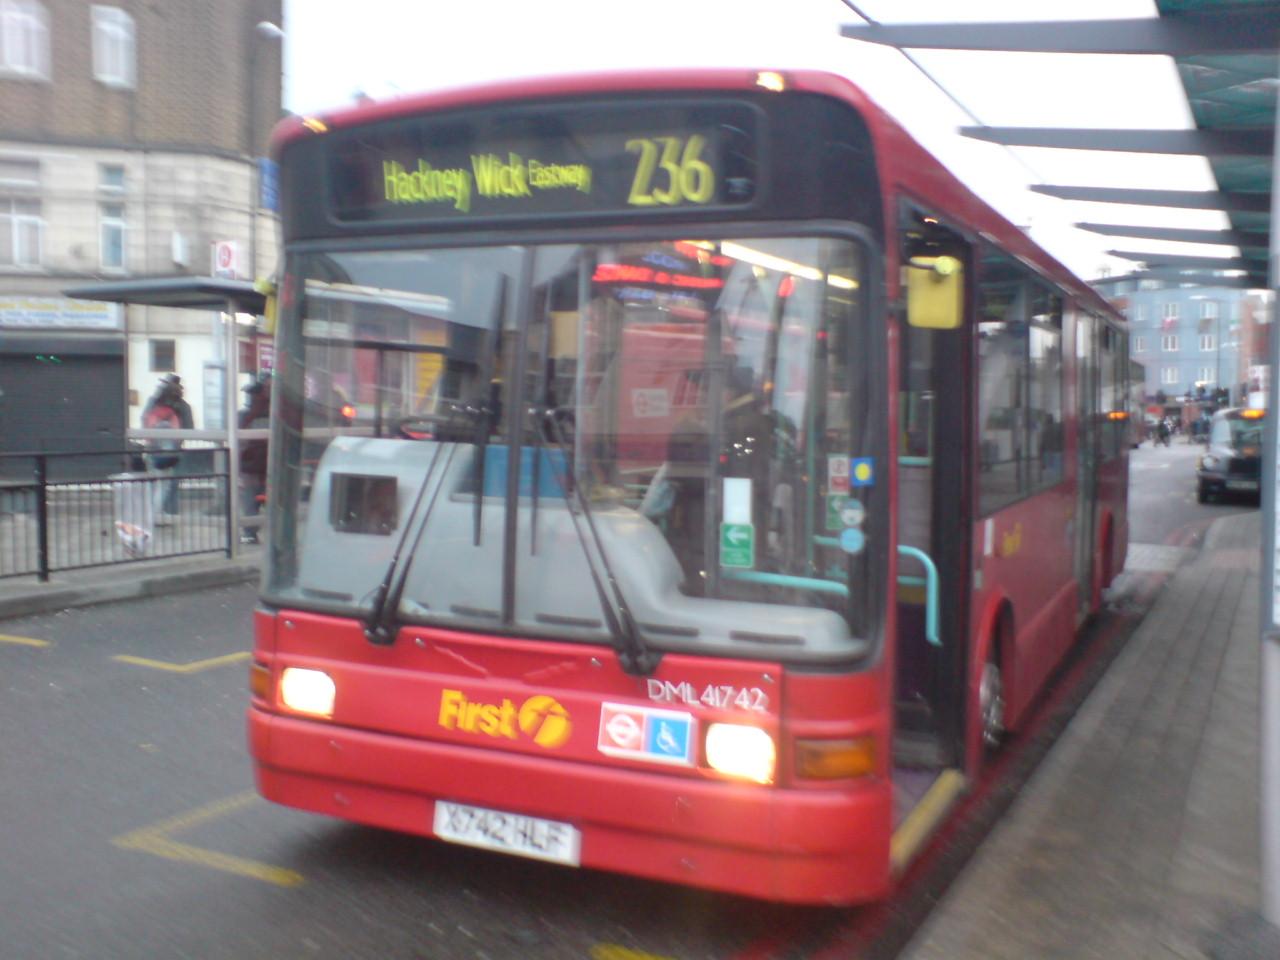 File:London Bus 236 at its terminus at Finsbury Park Station.jpg